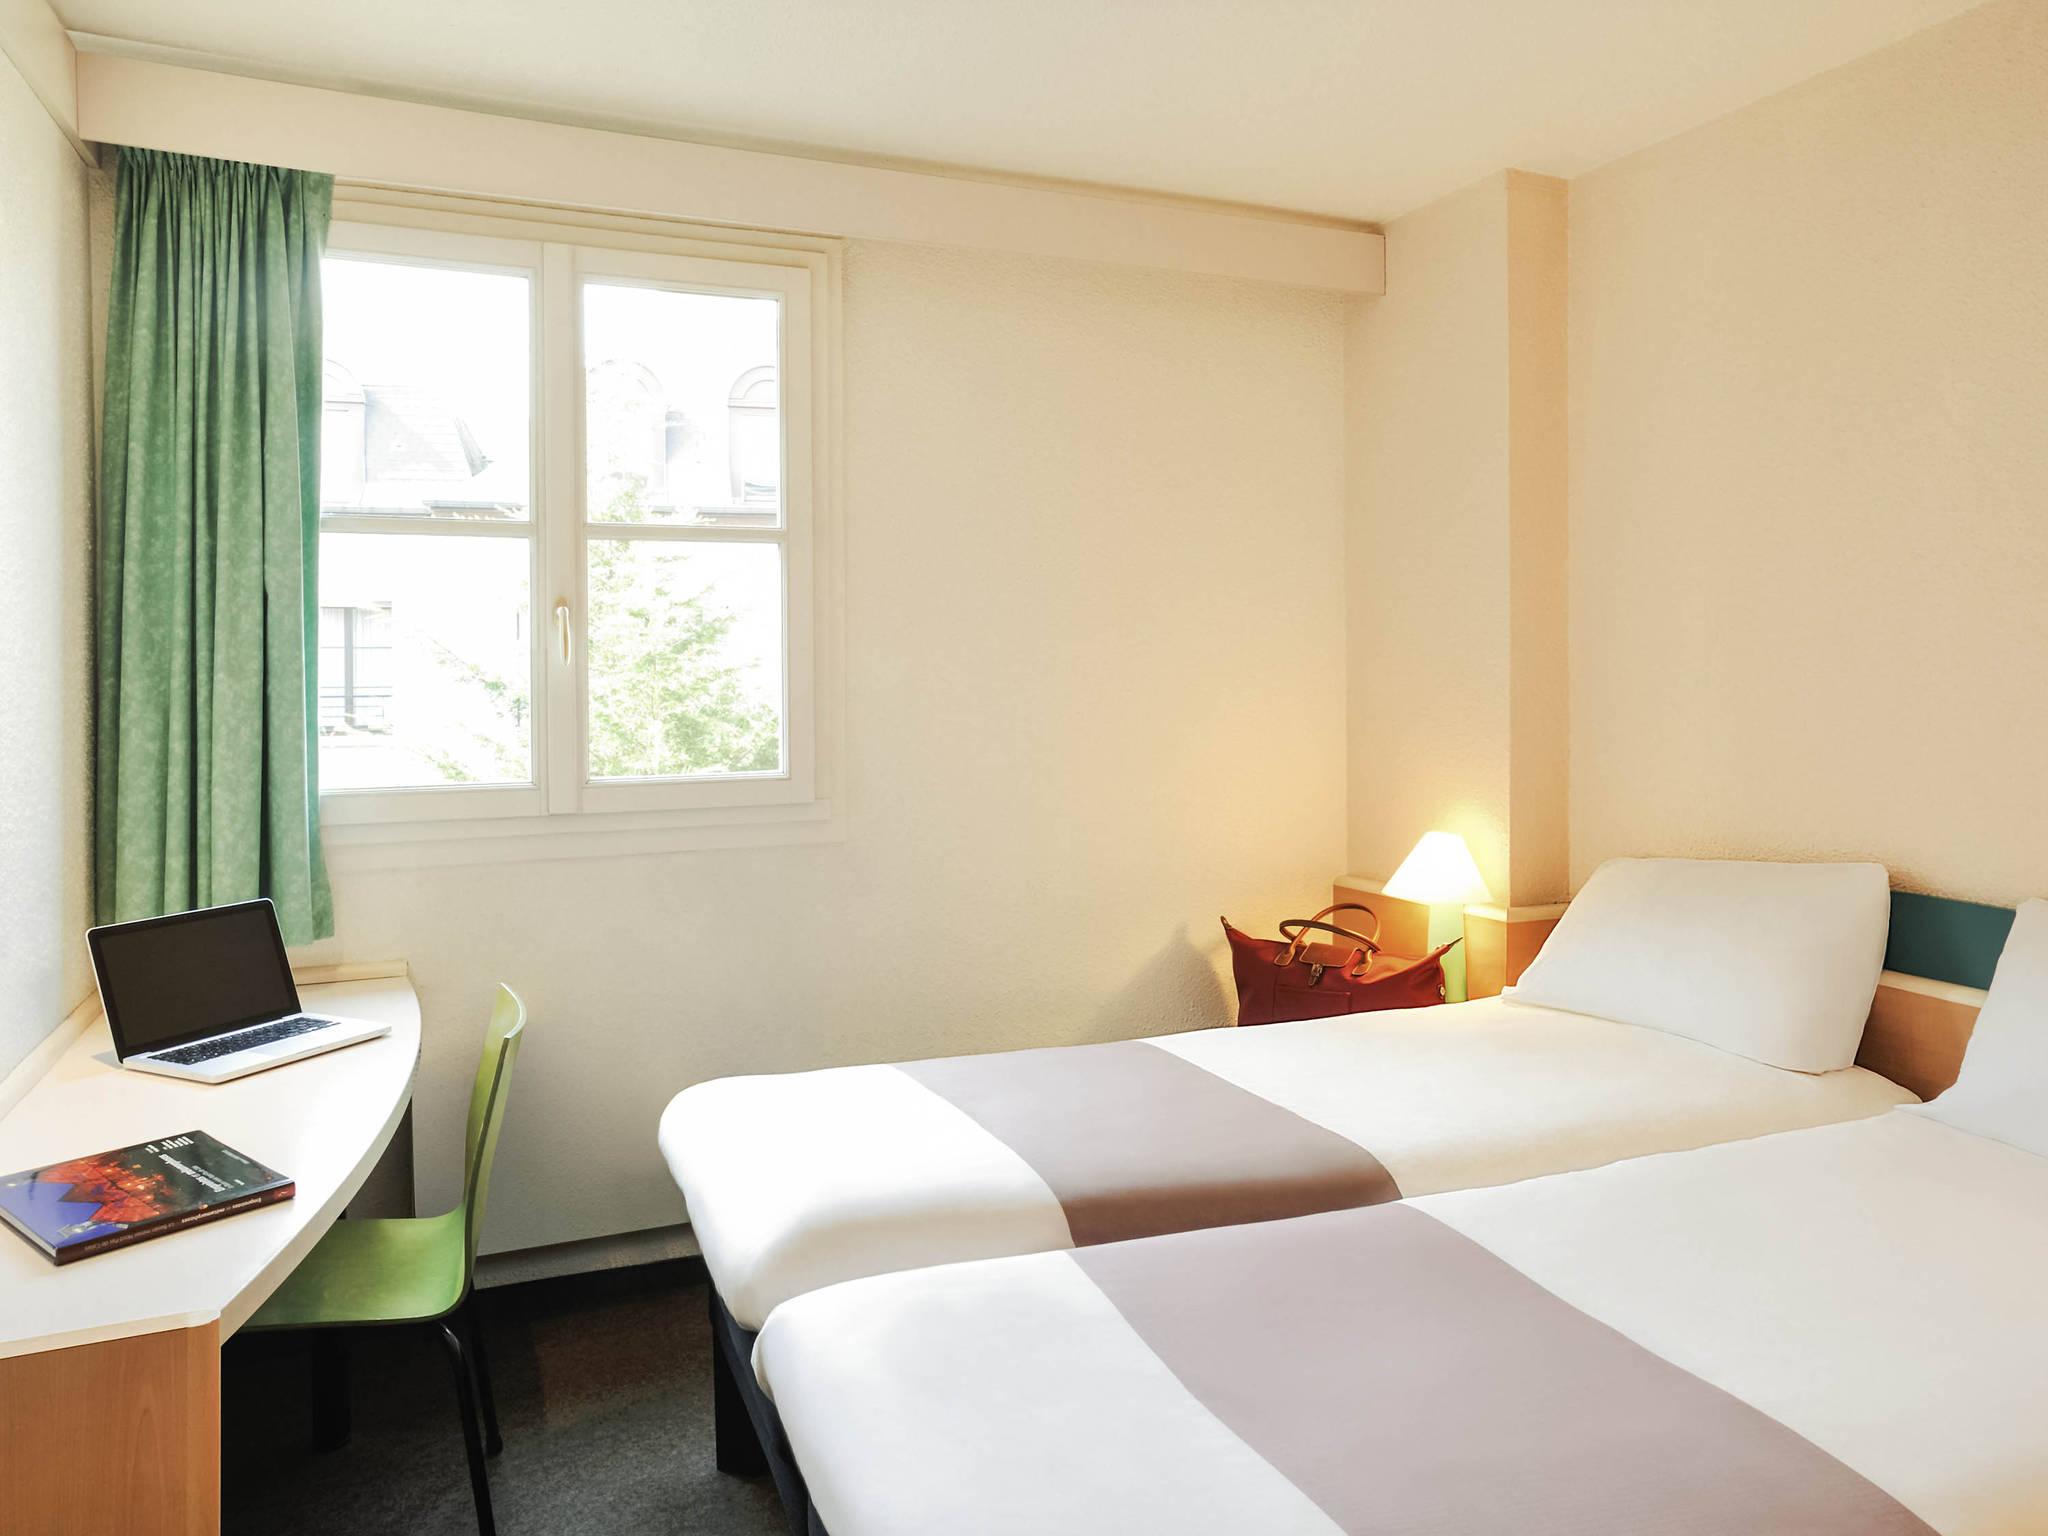 Hotel In Arras